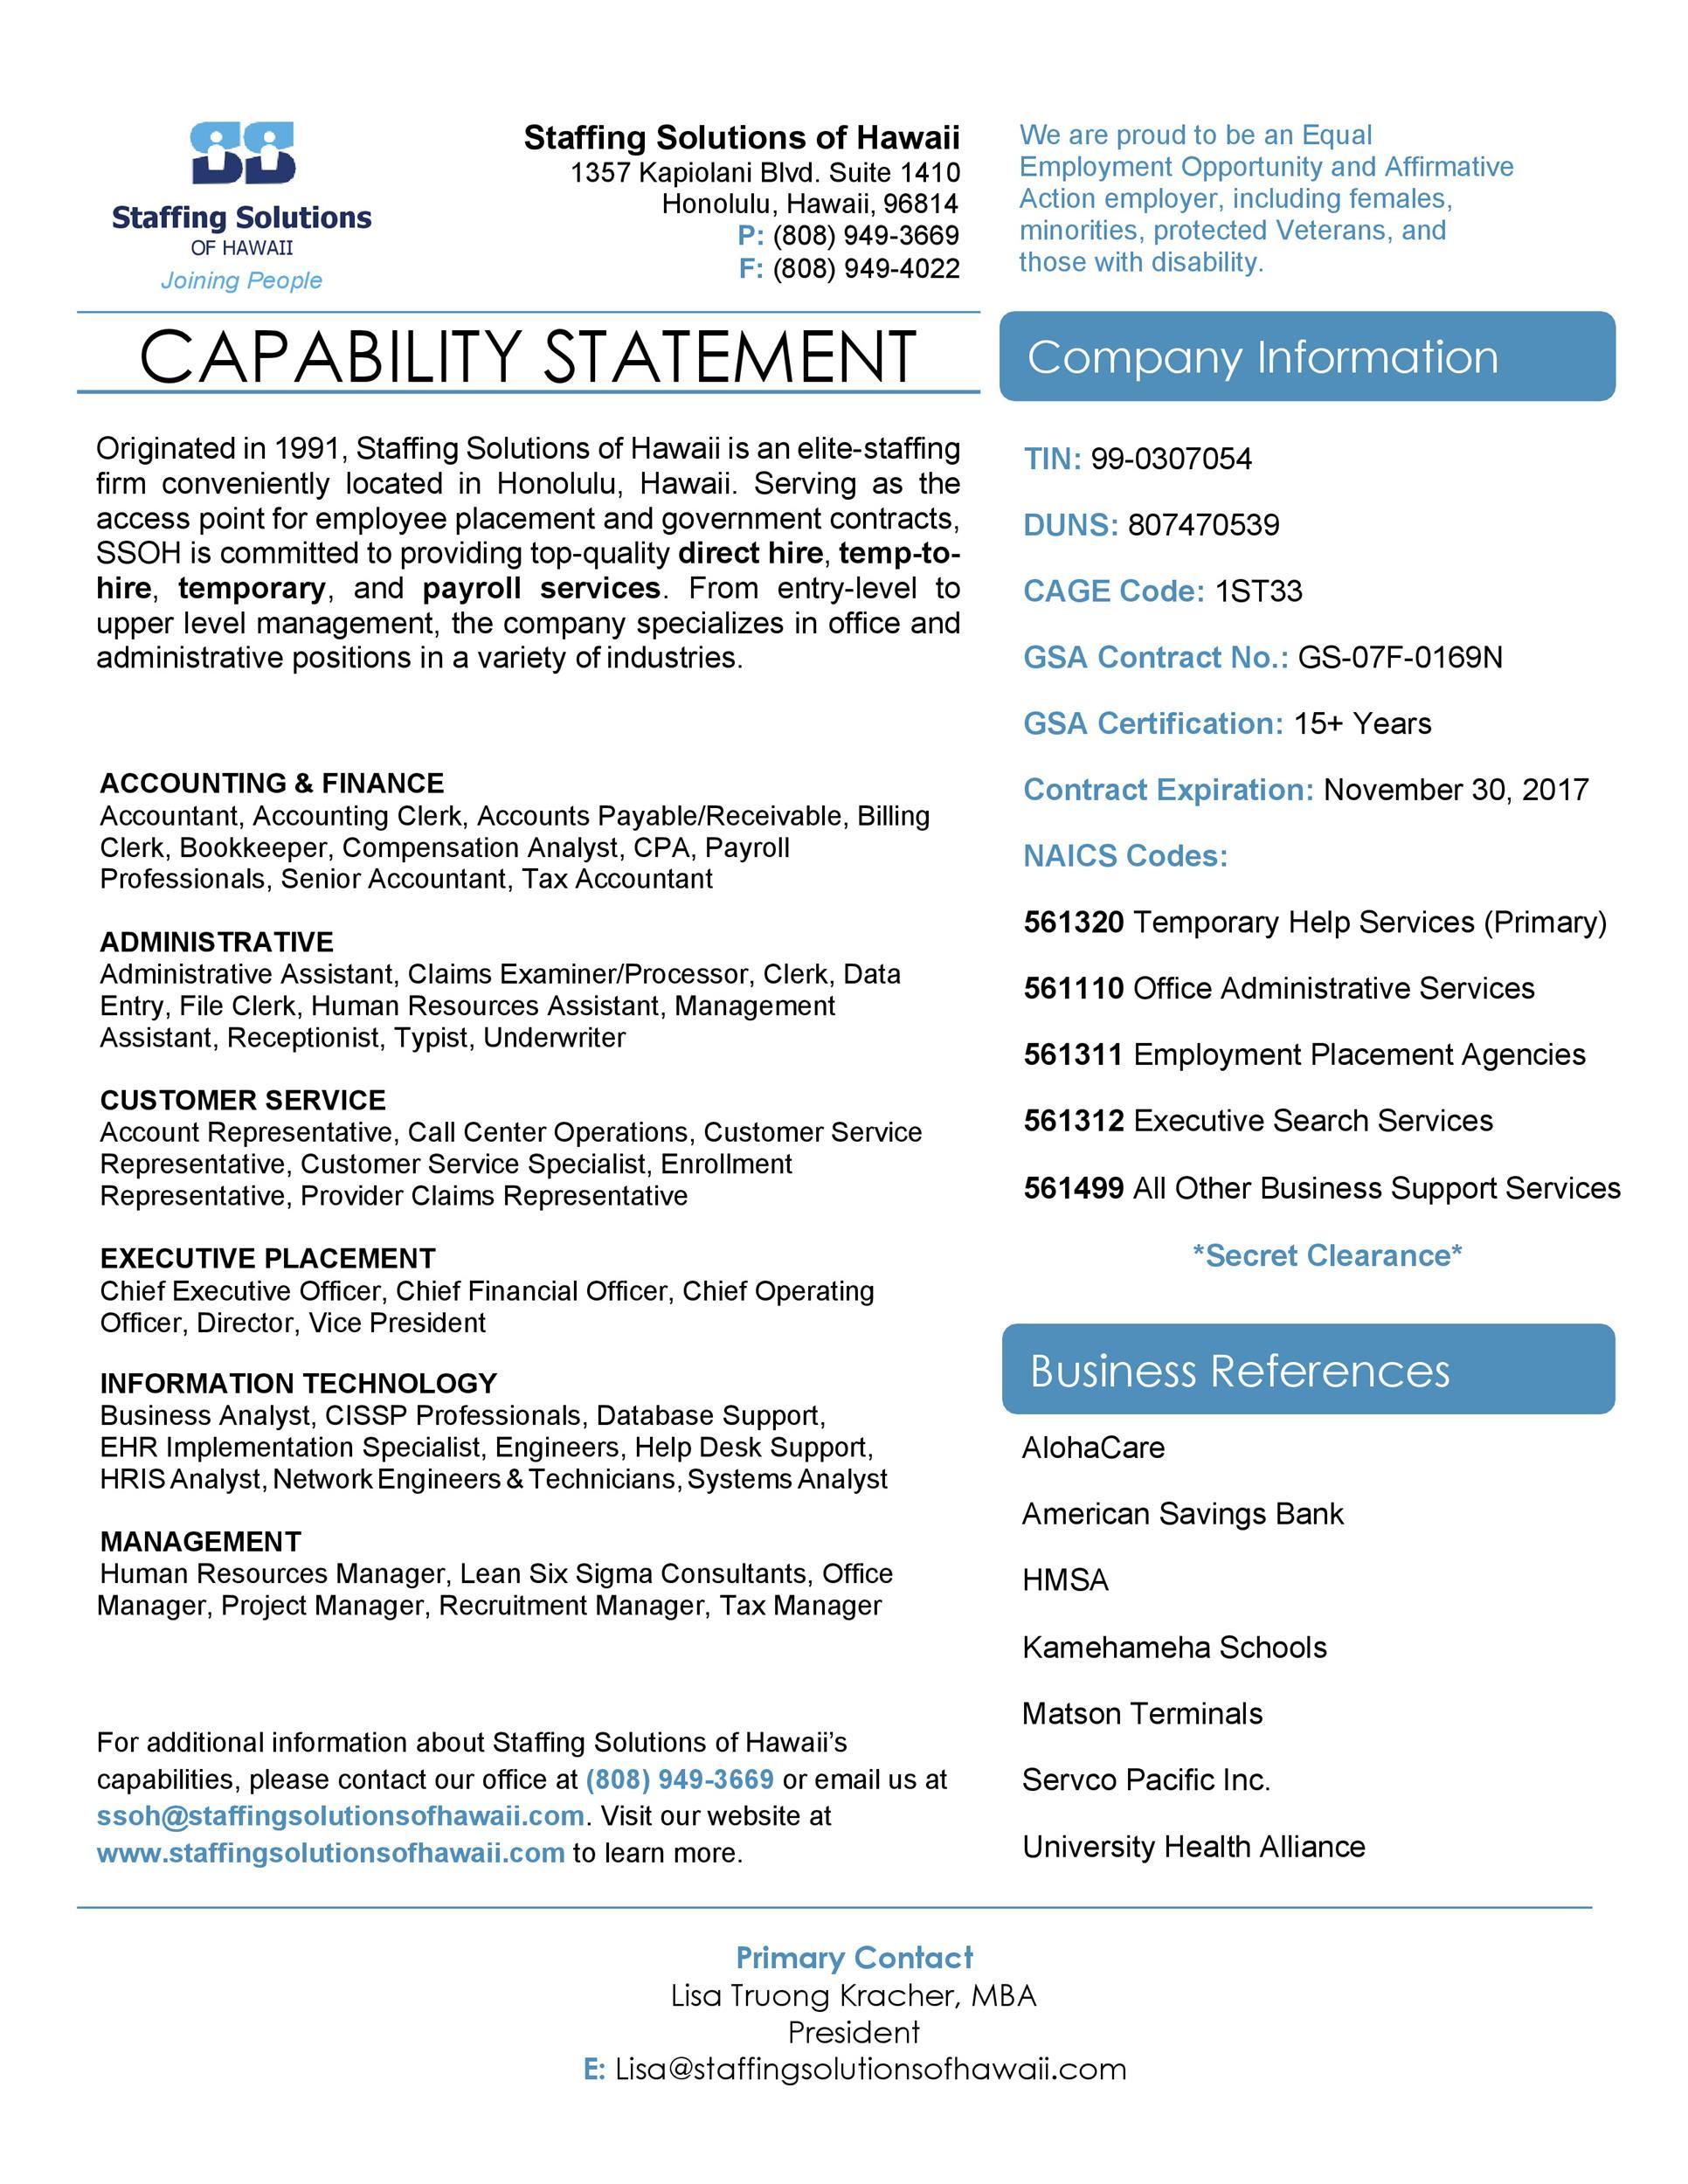 Free capability statement 15